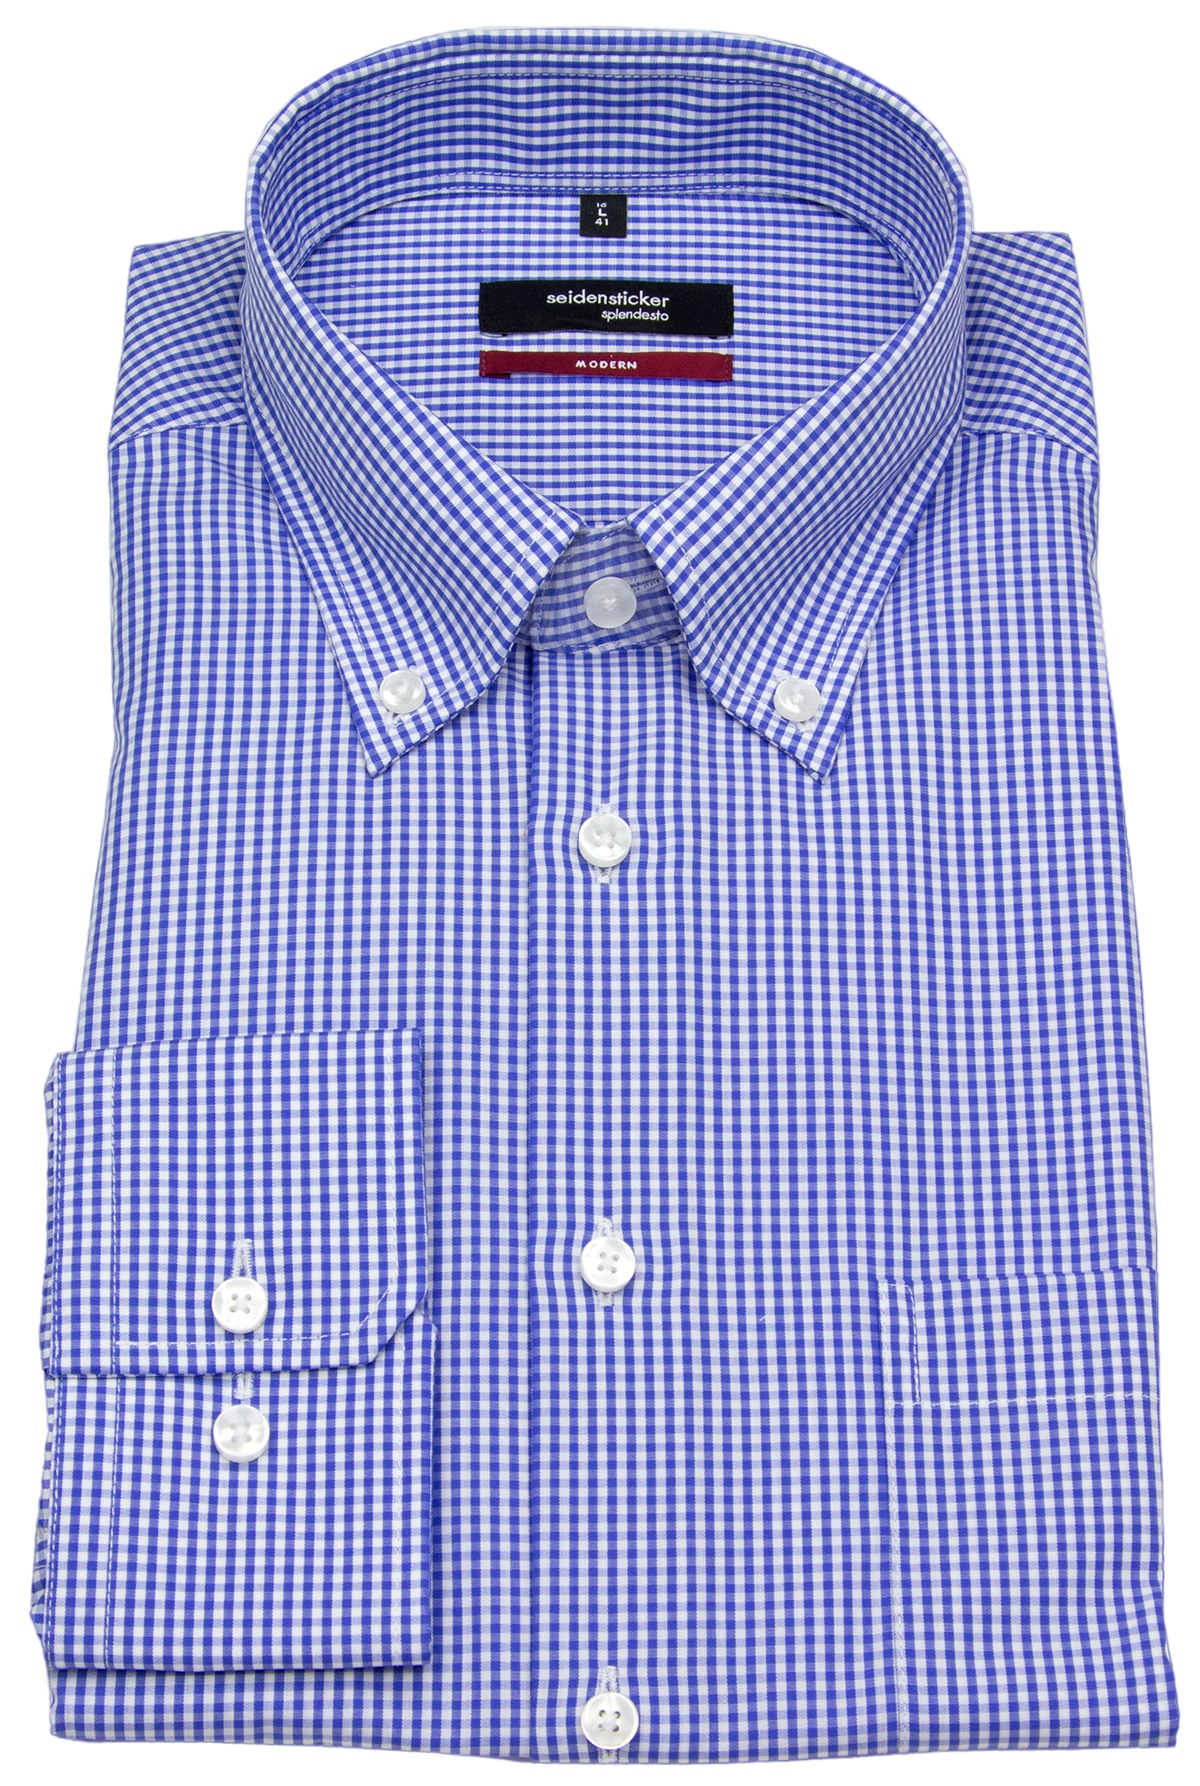 low priced 92a2e c6fa2 Seidensticker Hemd - Modern Fit - Button-Down Kragen - blau / weiß kariert